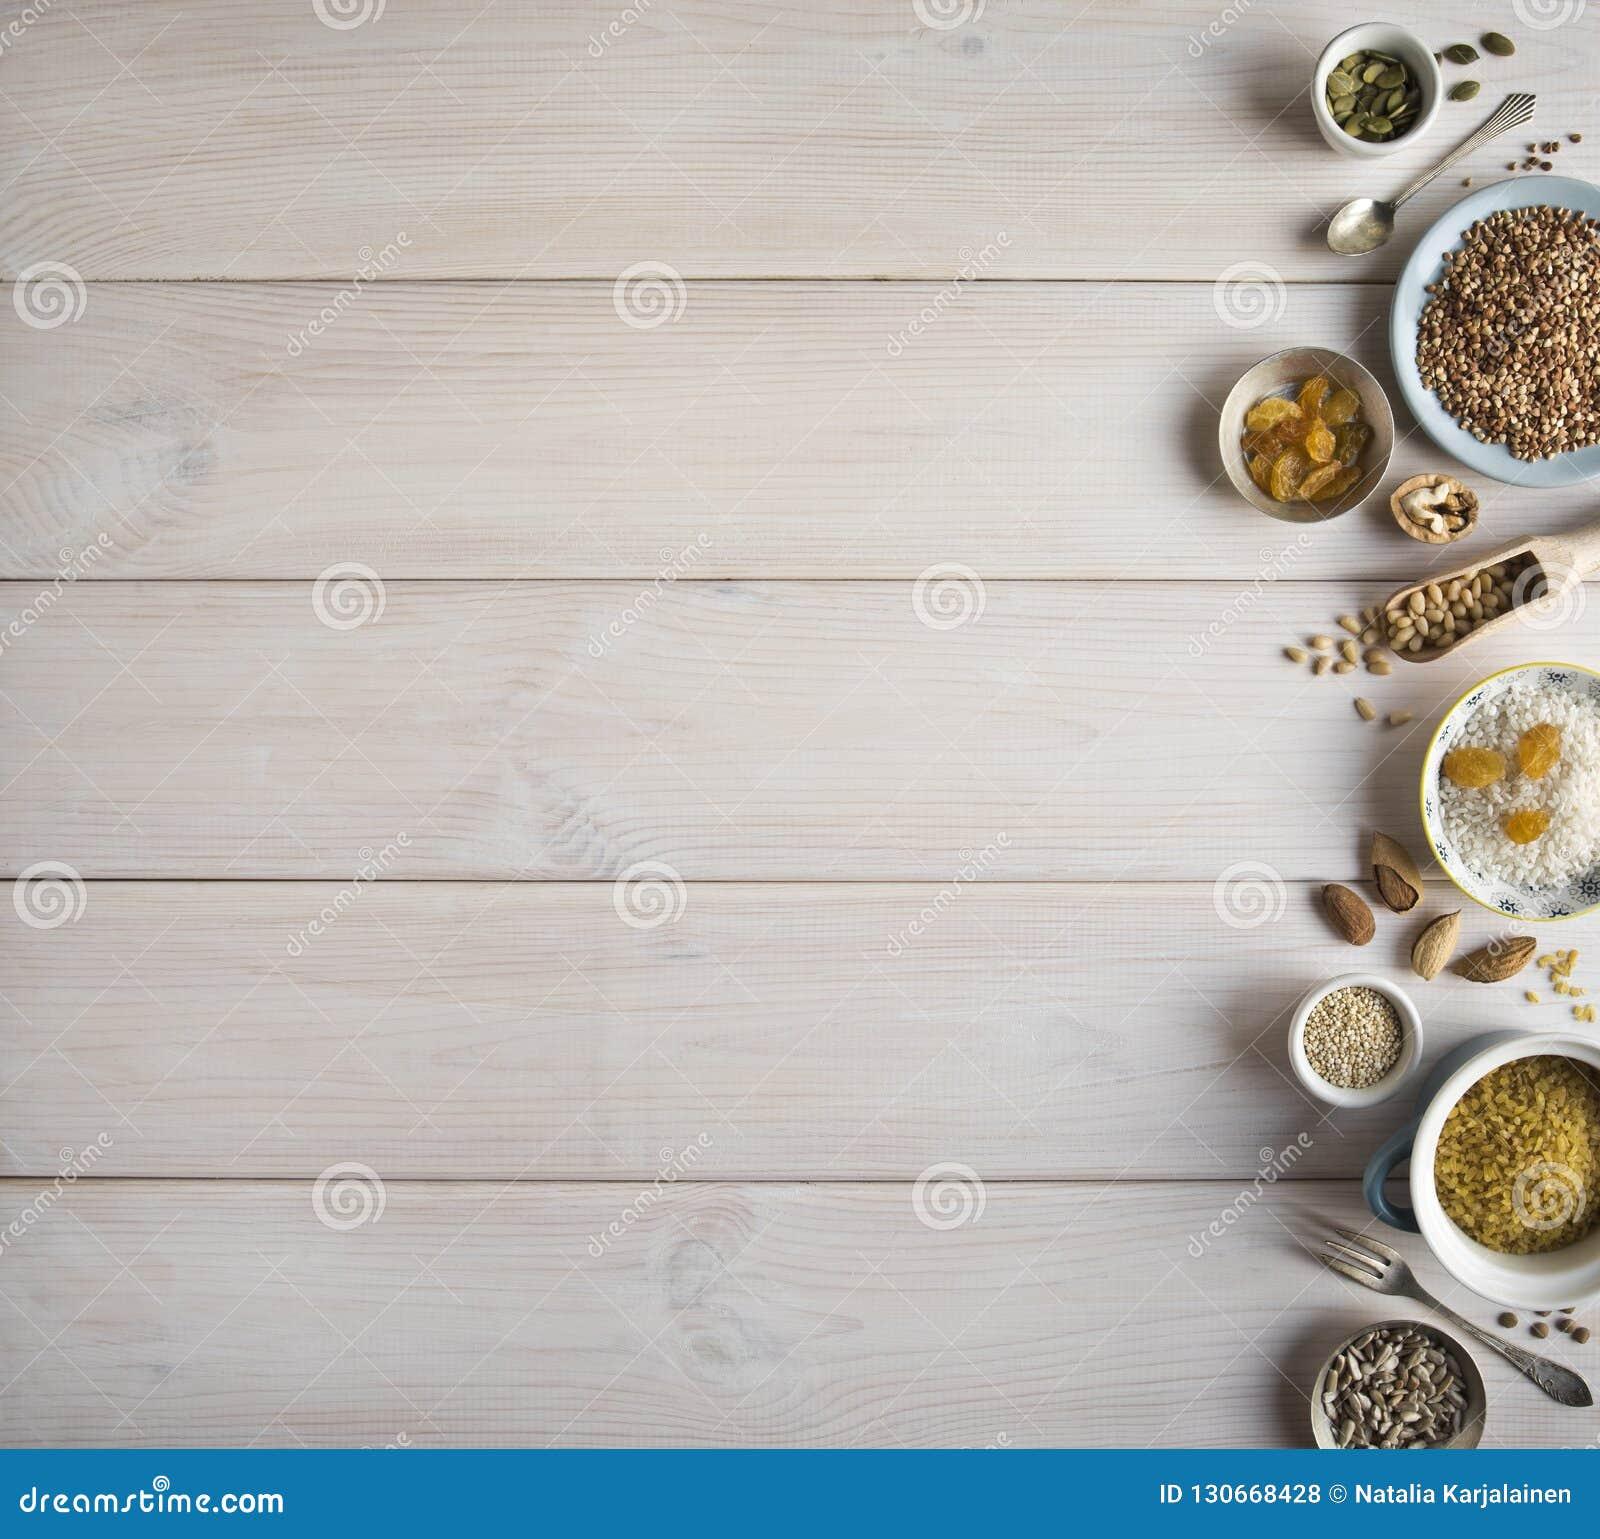 Different nuts, cereals, raisins on plates on a wooden table. Cedar, cashew, hazelnut, walnuts, almonds, pumpkin seeds, sunflower